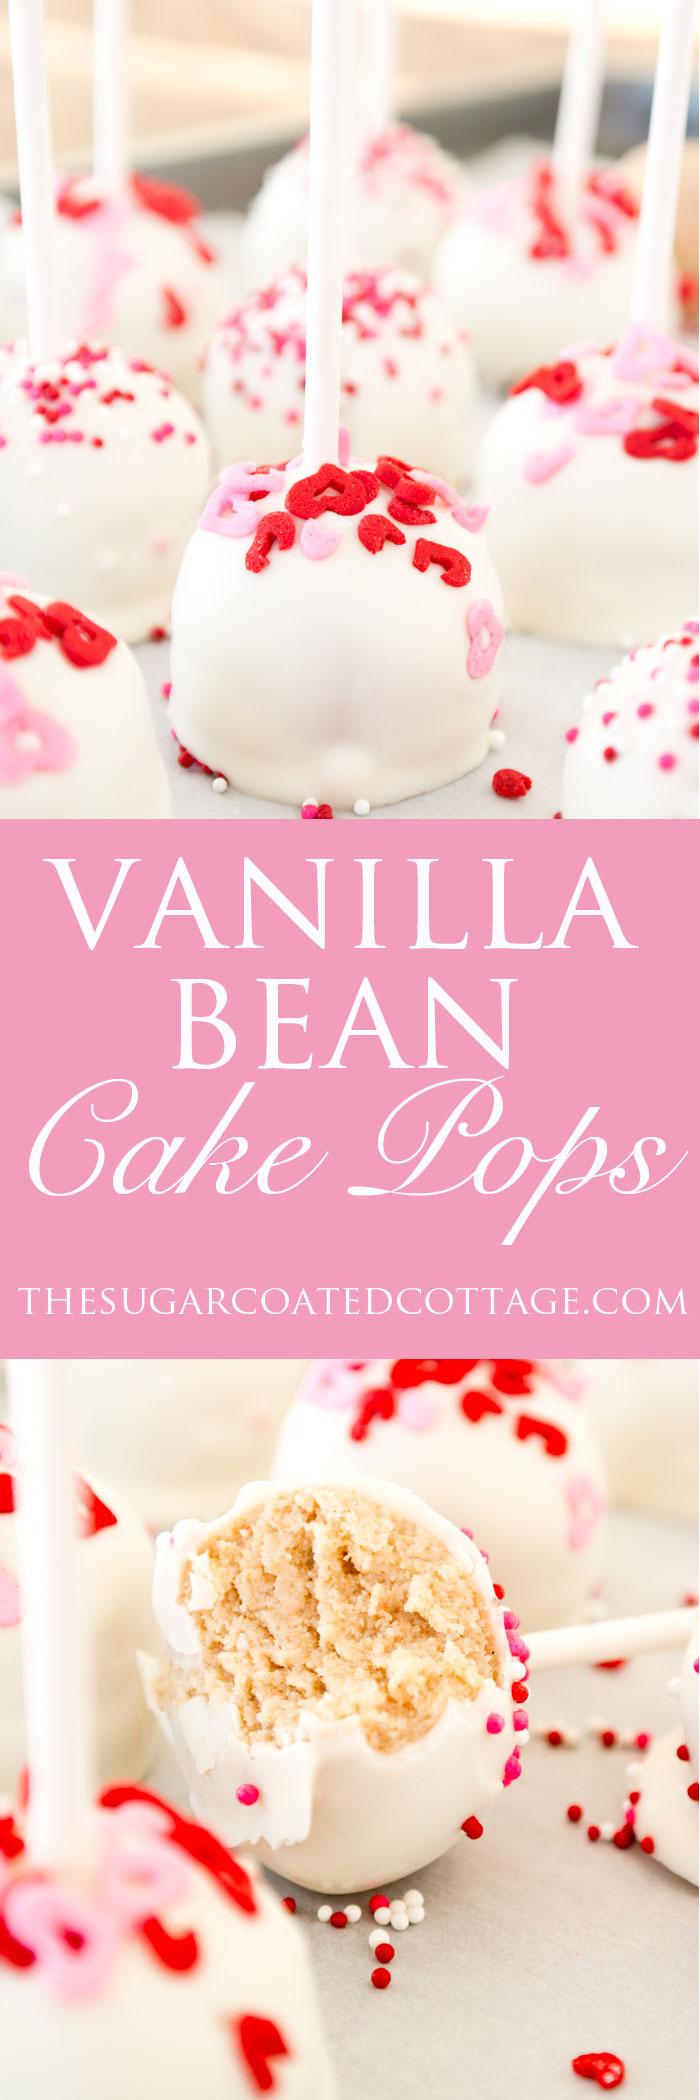 vanilla bean cake pops